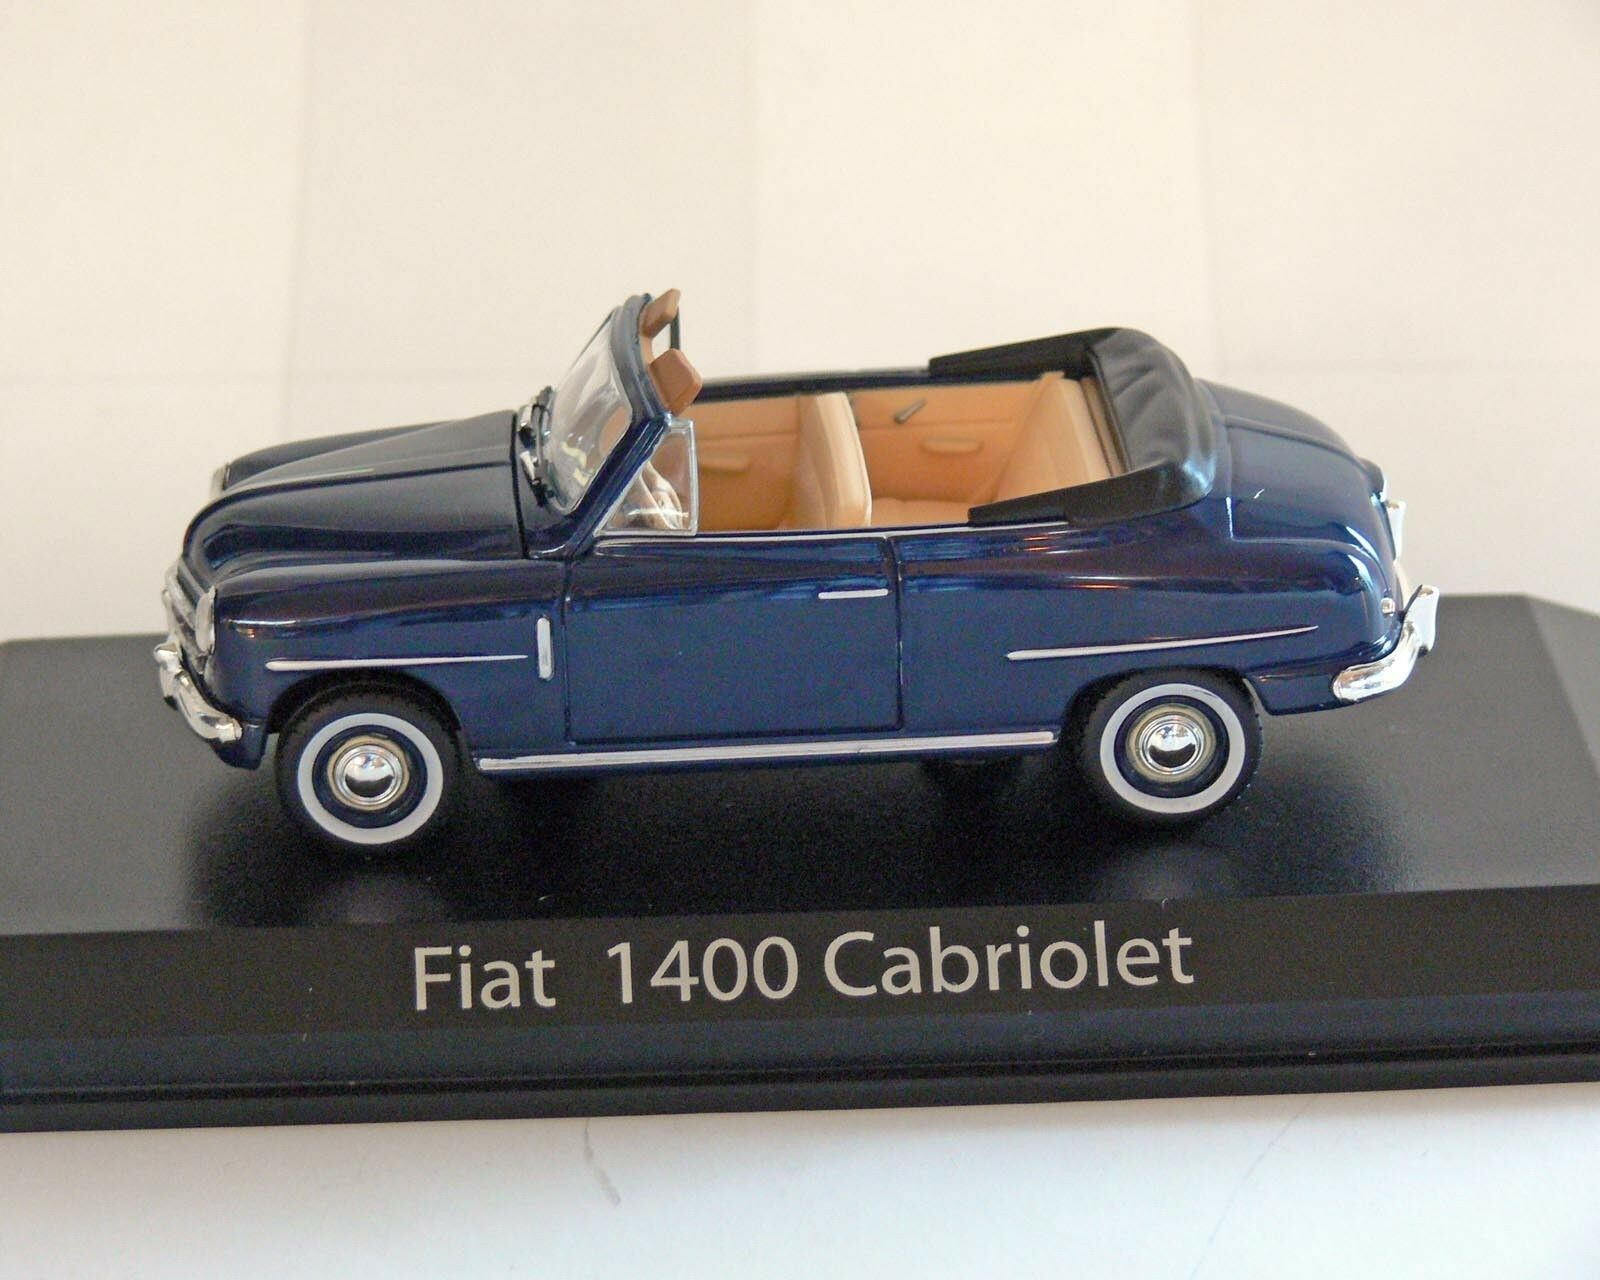 Fiat 1400 Cabriolet, bluee, 1 43, Norev